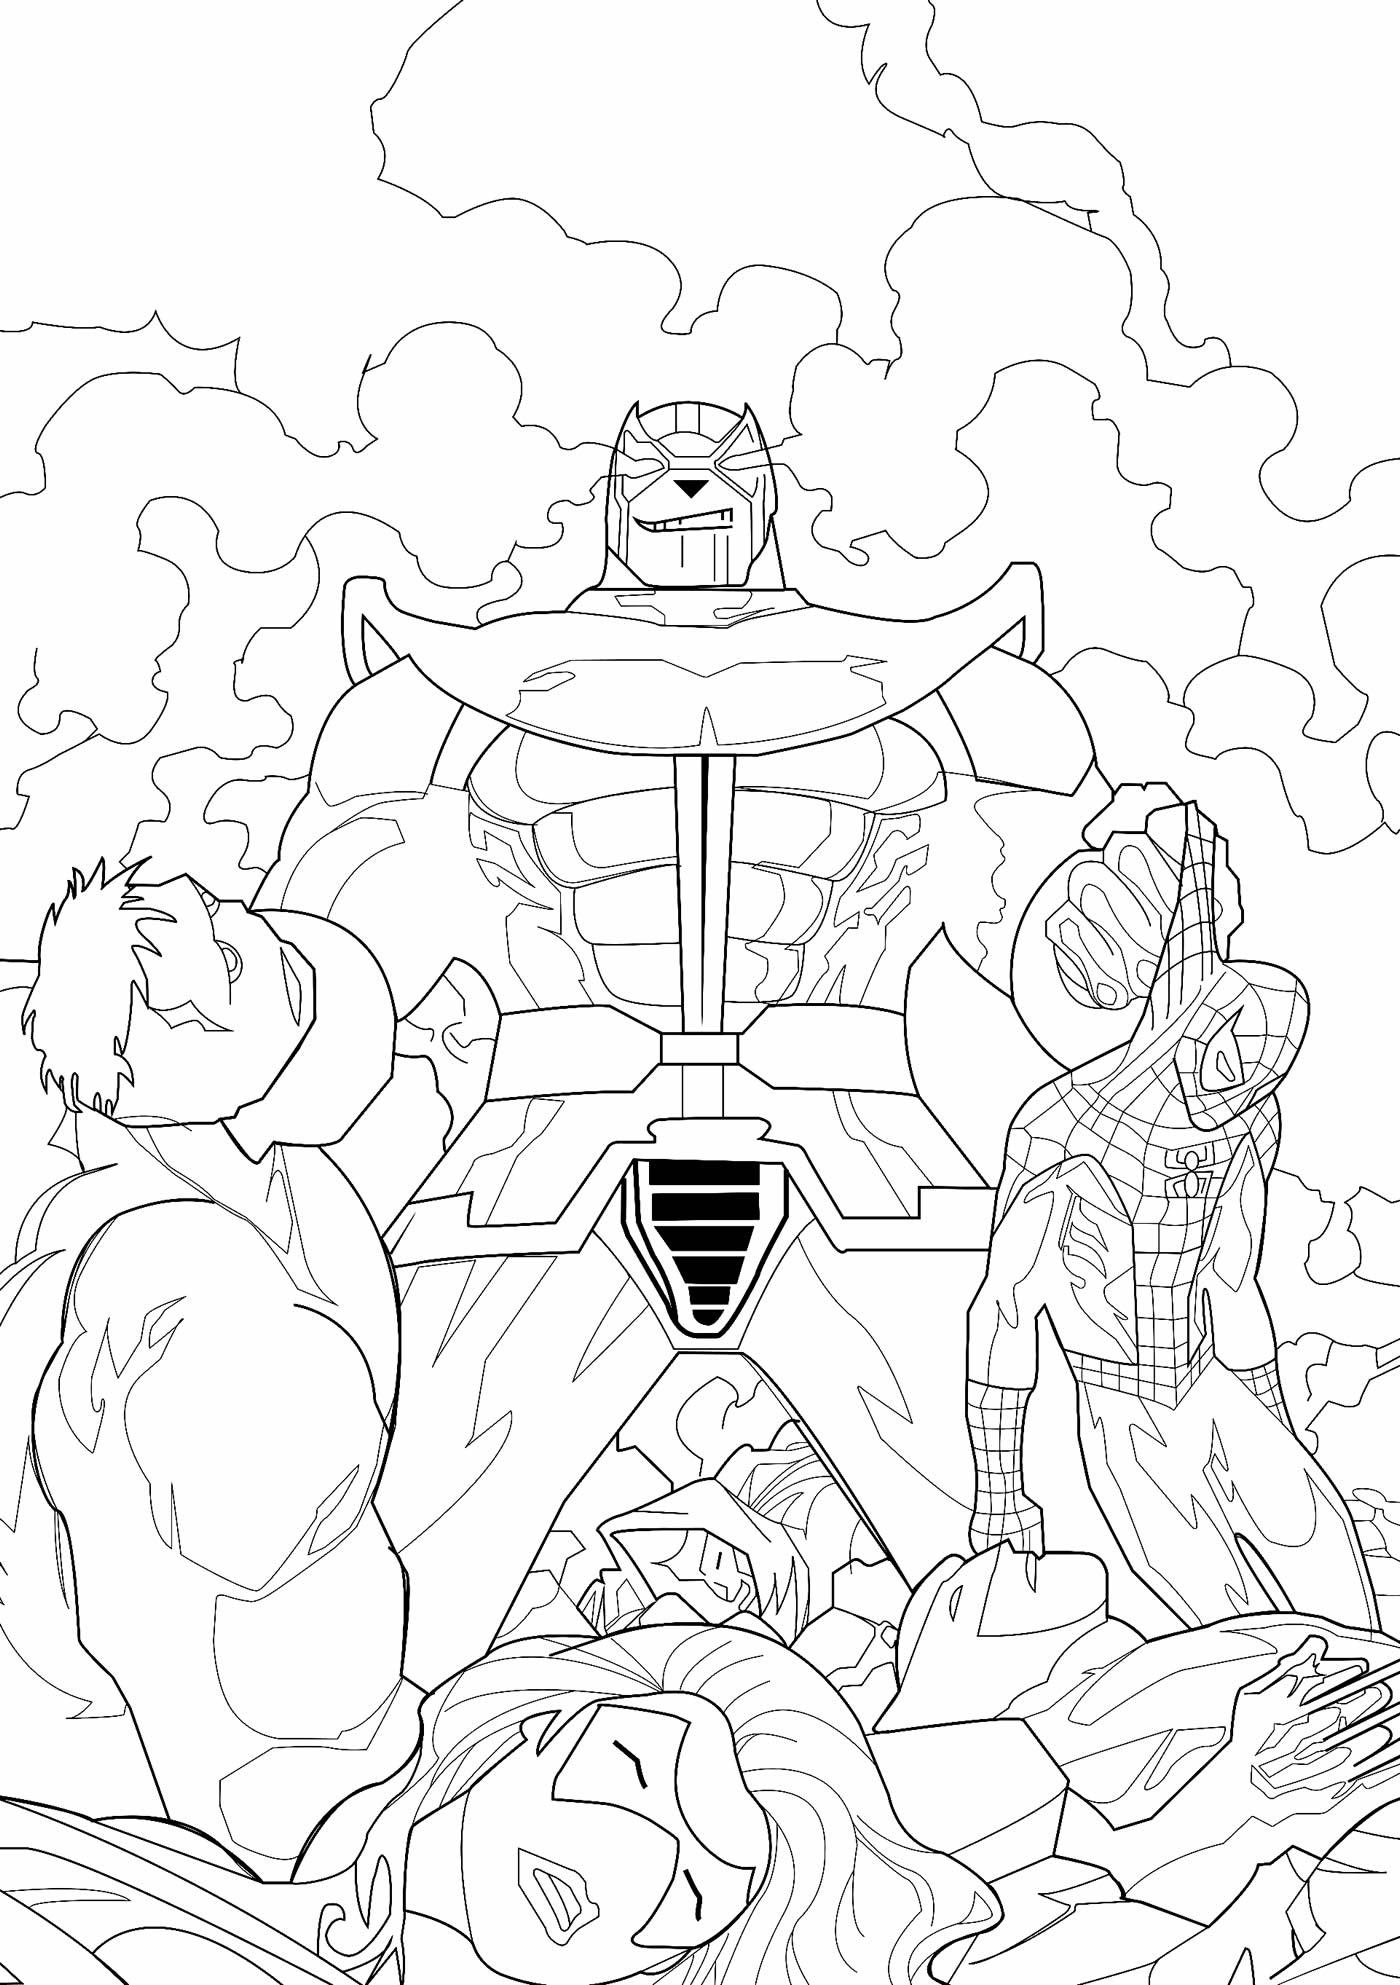 Desenho dos Vingadores para pintar